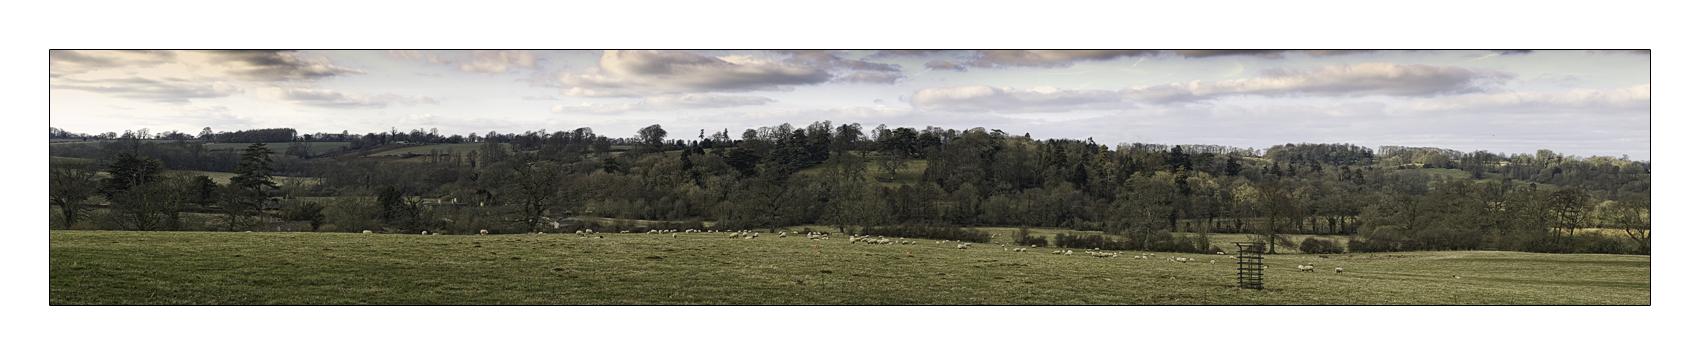 Spring Panorama by GazDabbs